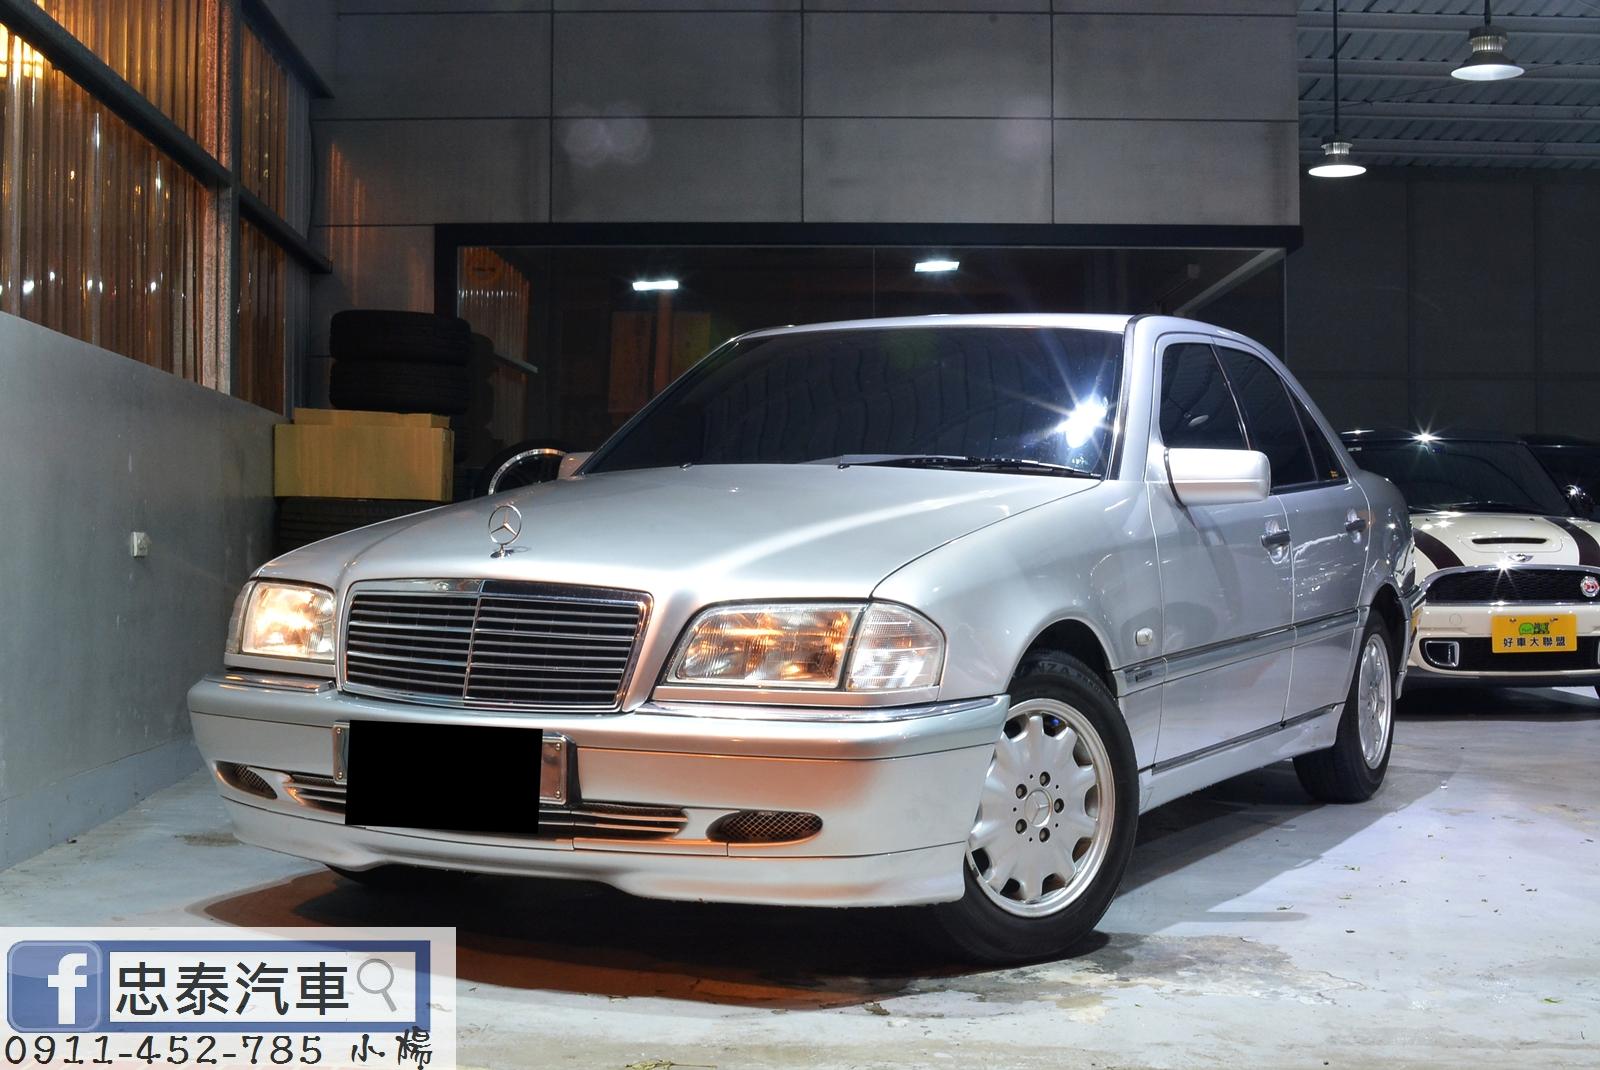 1998 M-benz C-class